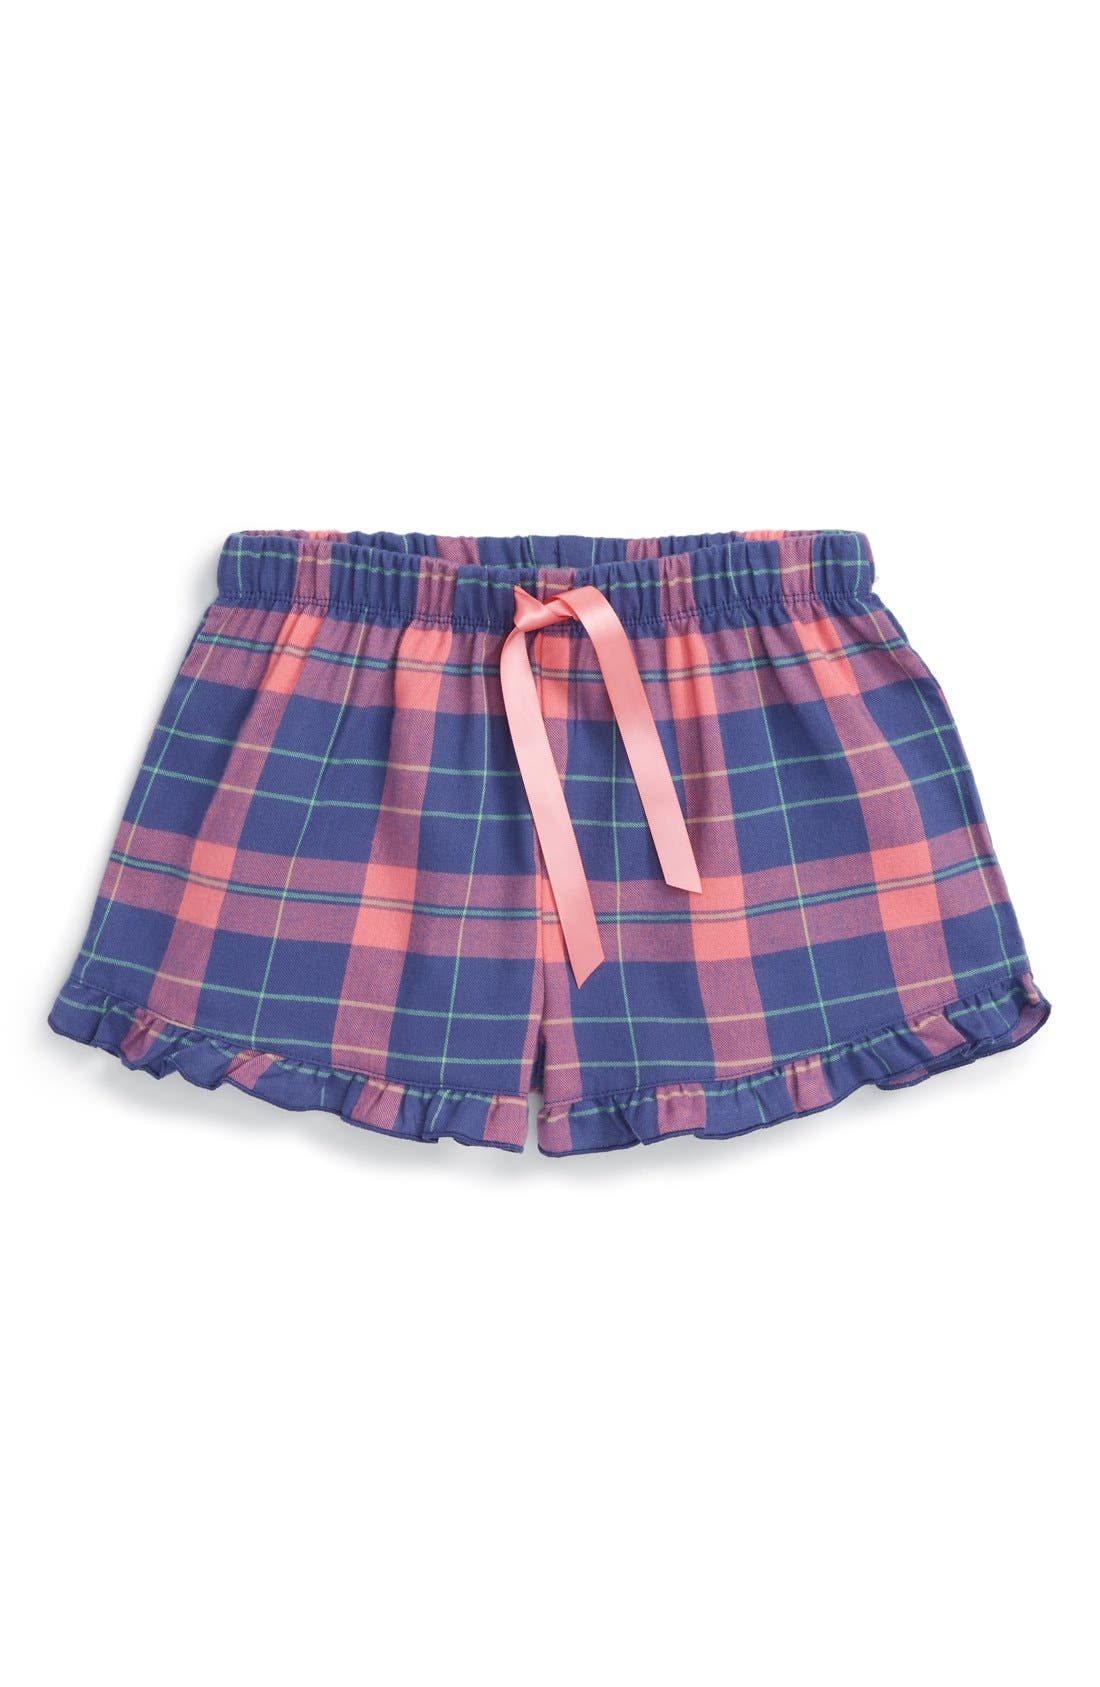 Flannel Shorts,                             Main thumbnail 1, color,                             410